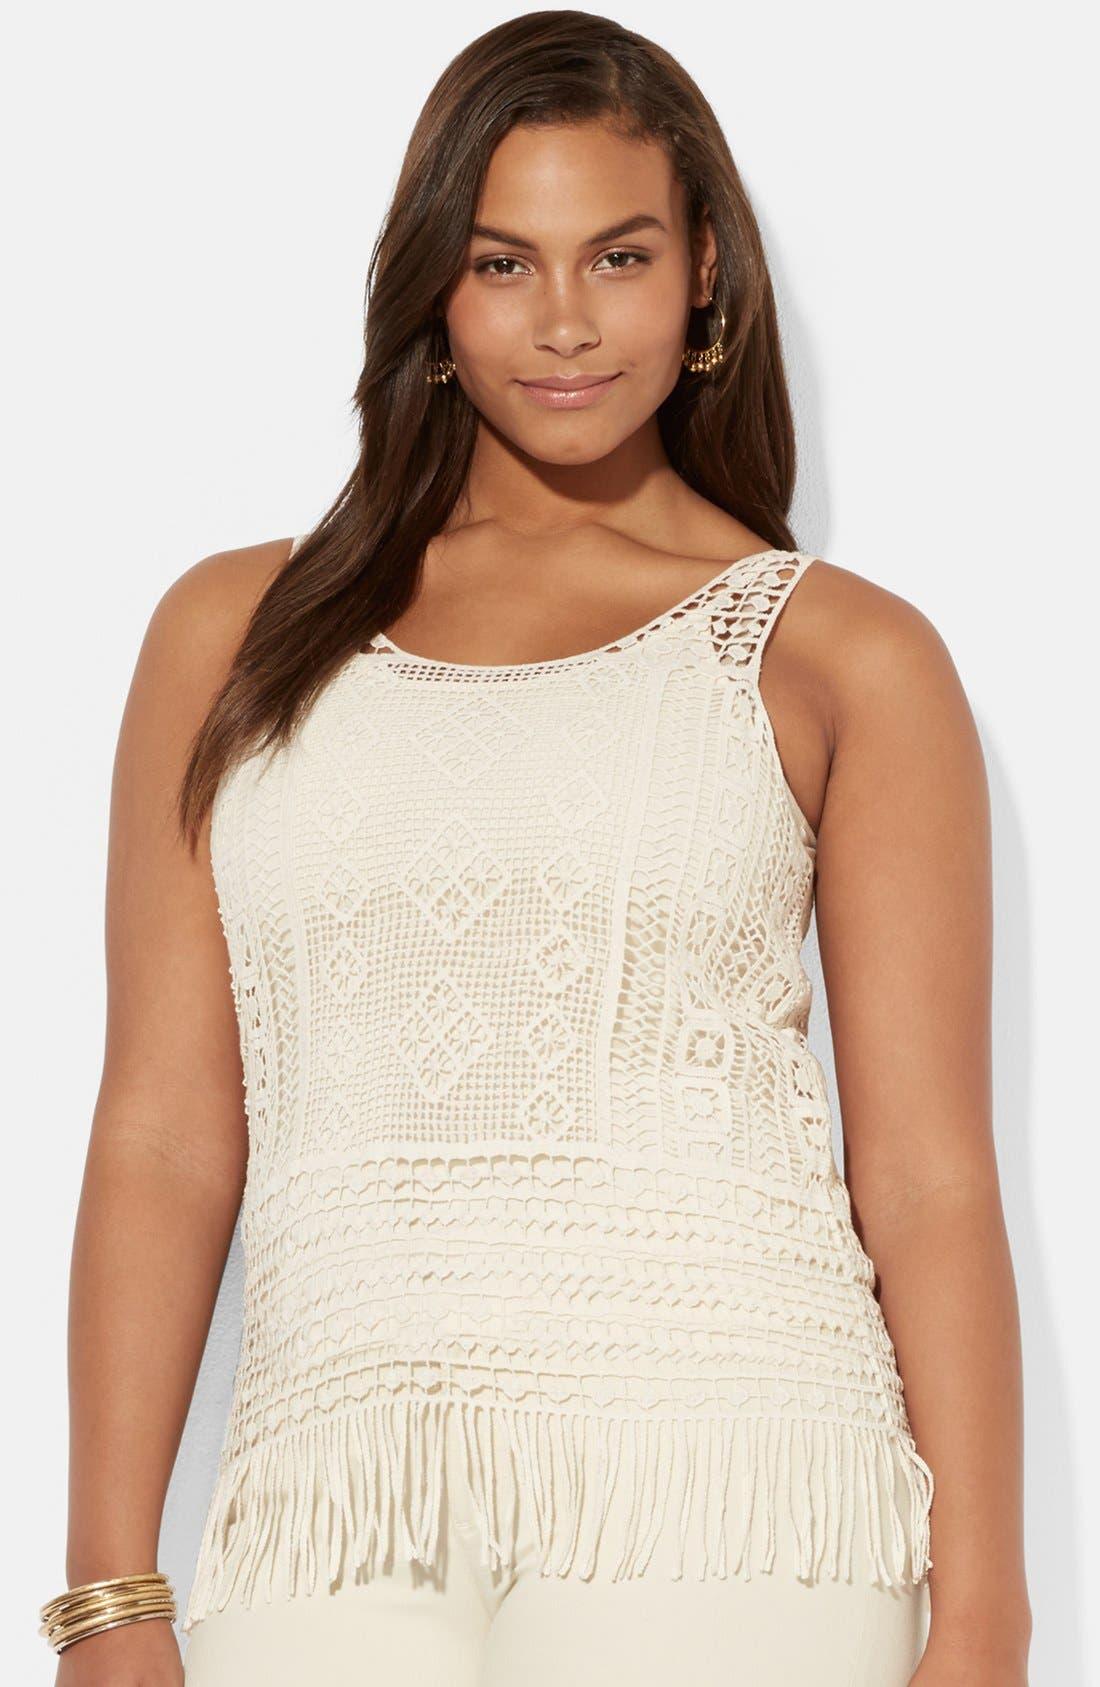 Alternate Image 1 Selected - Lauren Ralph Lauren Fringed Cotton Crochet Tank with Camisole (Plus Size)